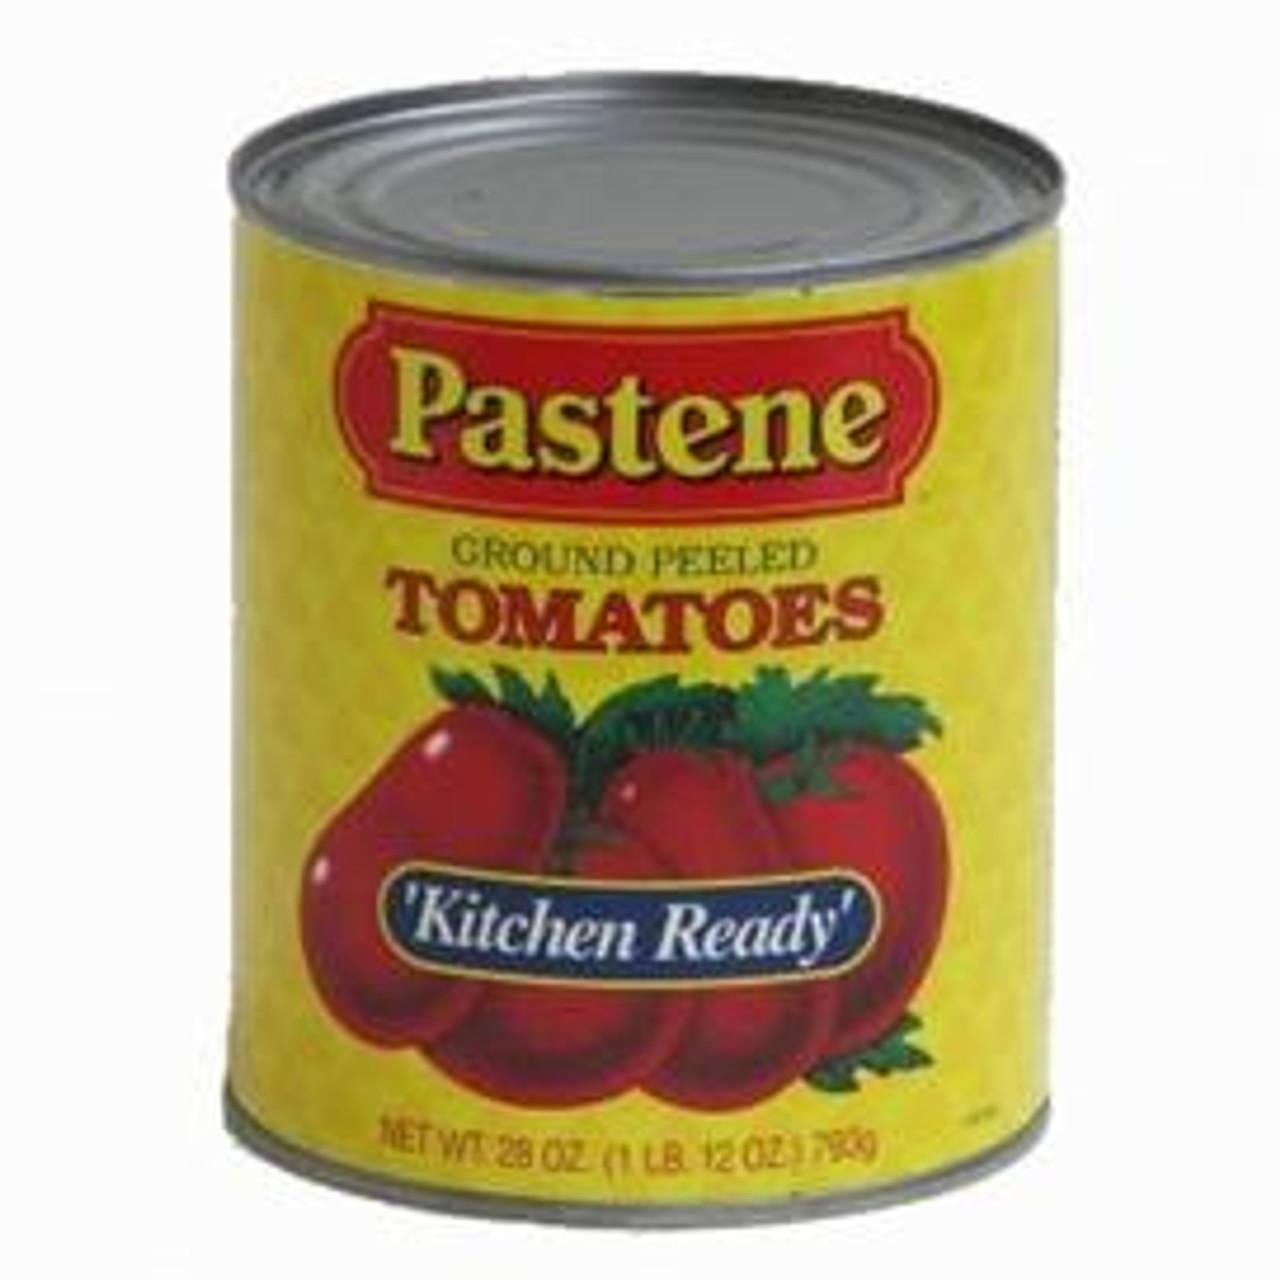 Ground Peeled Tomatoes